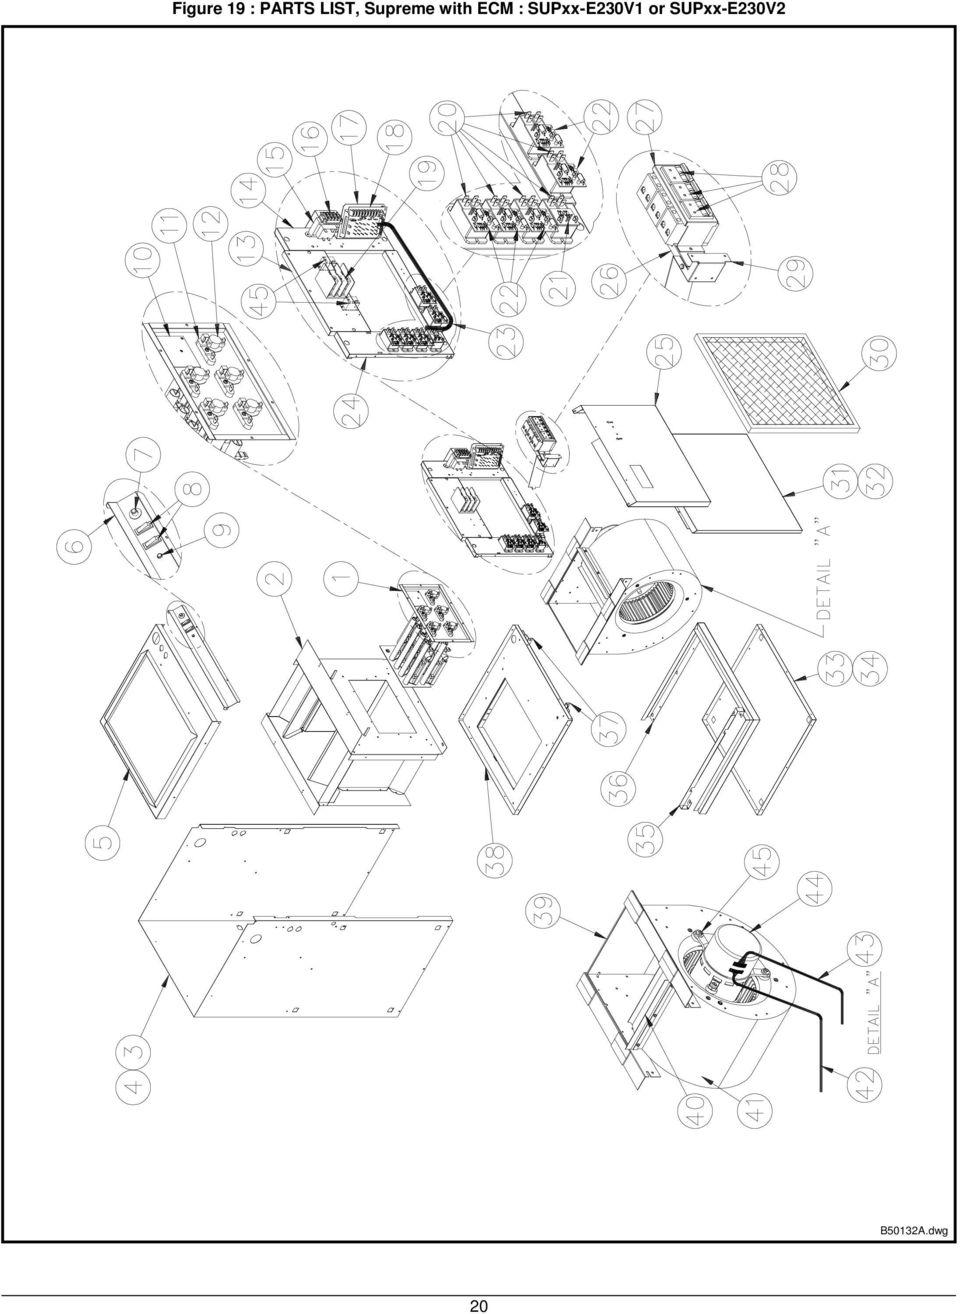 medium resolution of multi position variable speed blower motor ecm sup15 e230v1 sup18 two speed motor starter wiring diagram multi speed fan motor diagram